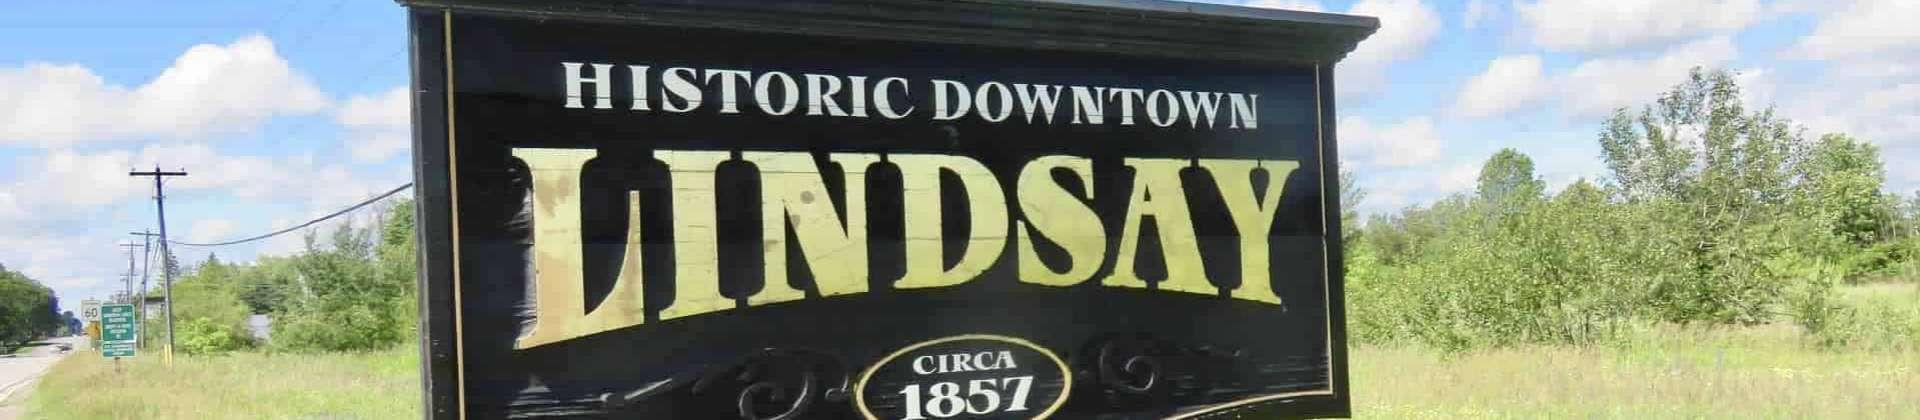 Lindsay Ontario downtown sign